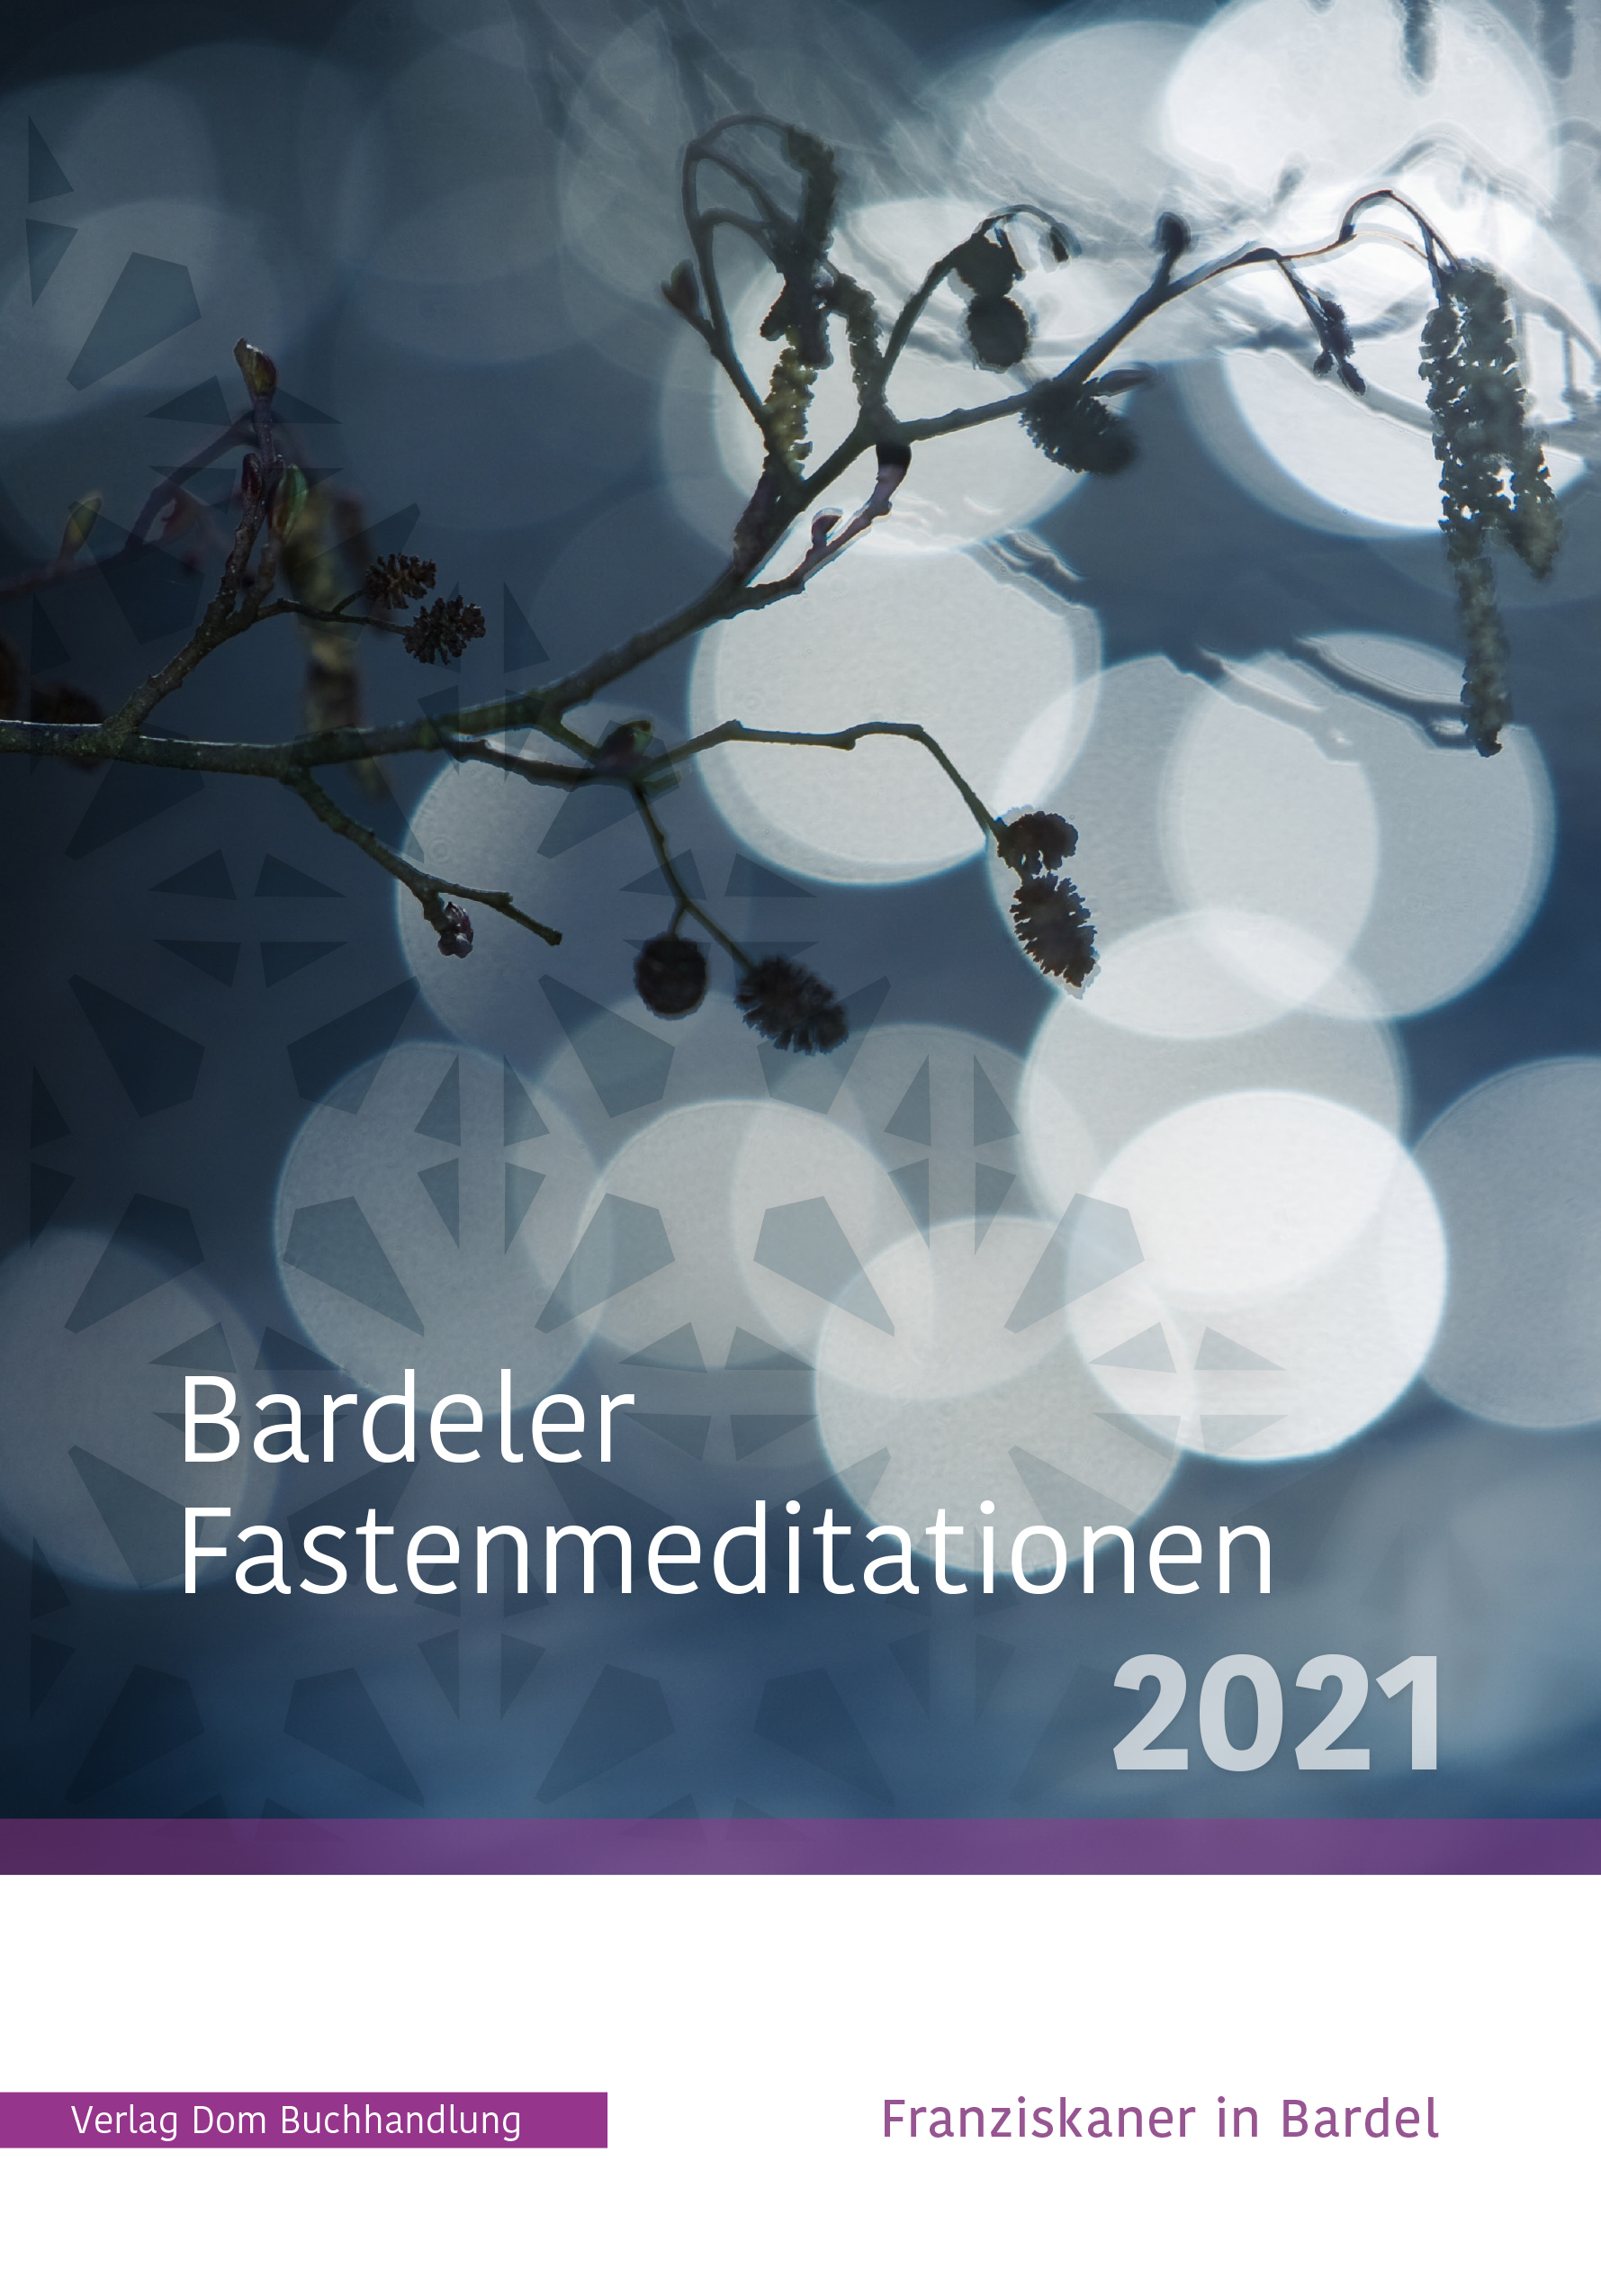 Bardeler Fastenmeditationen 2021 - Cover